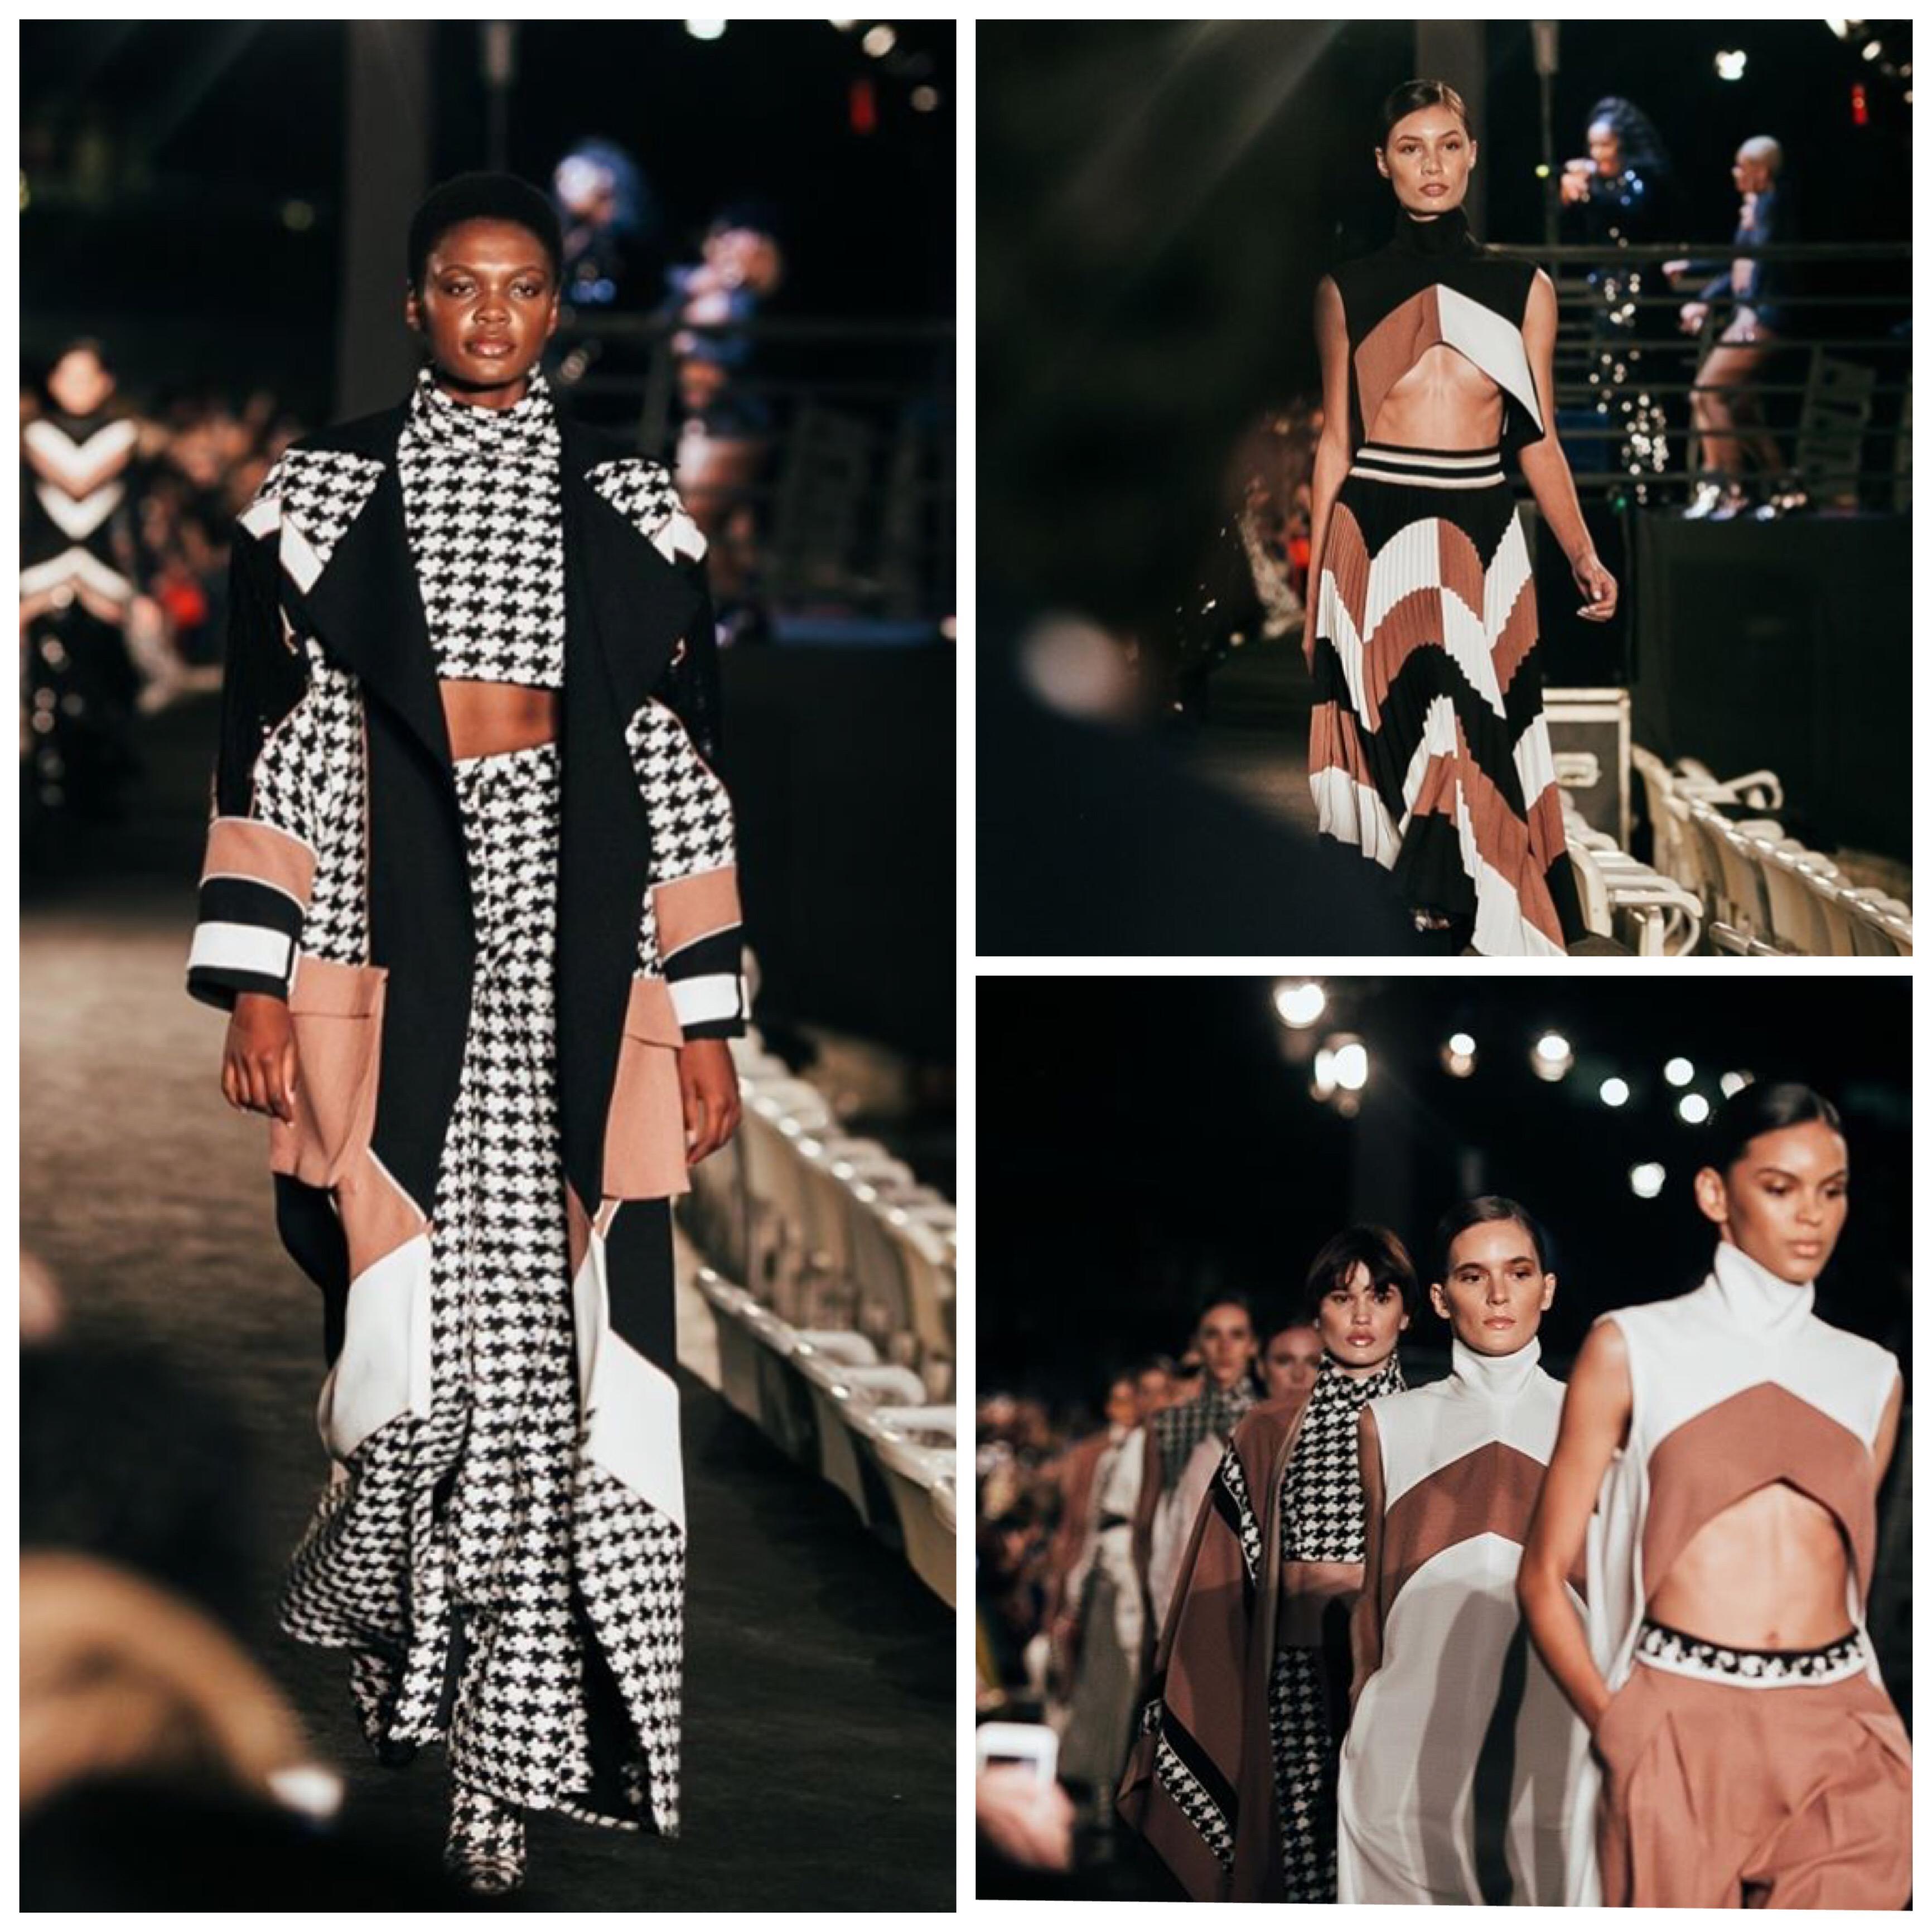 c0d4330d5a Desfile Skazi - Inverno 2019 | Consultoras de Moda BH